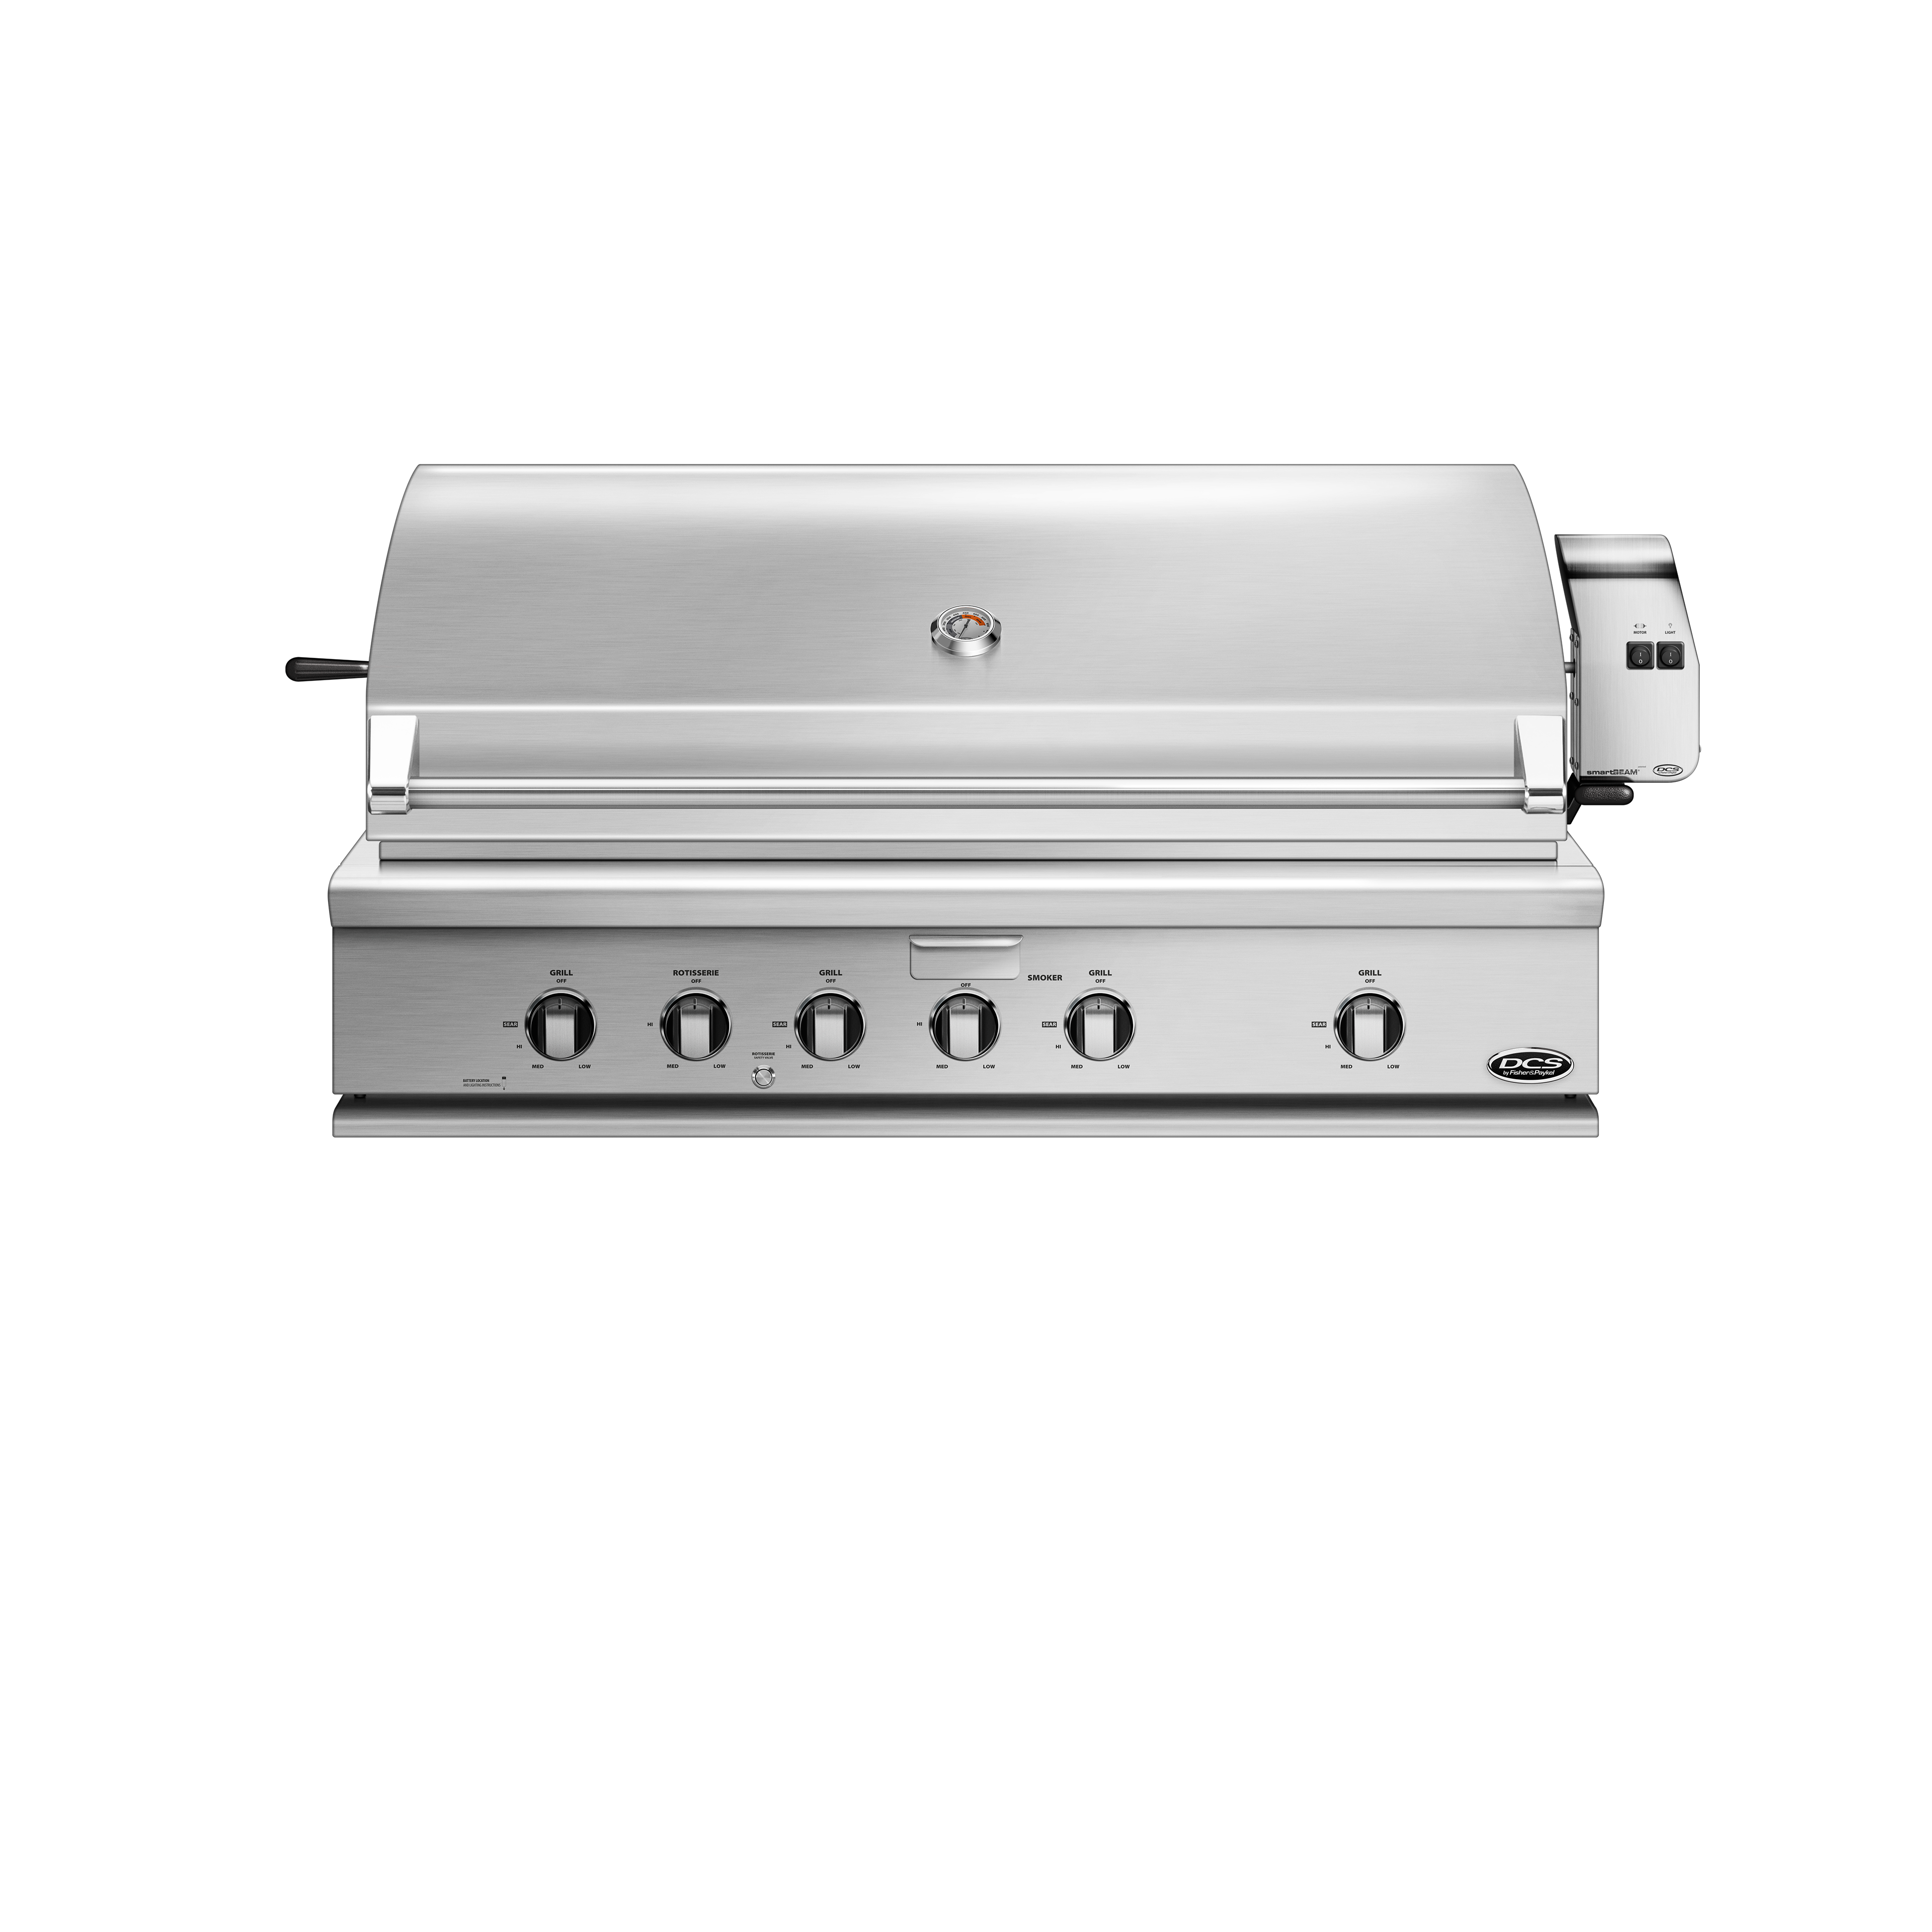 "Model: BH1-48R-N | DCS 48"" Series 7 Grill, Natural Gas"